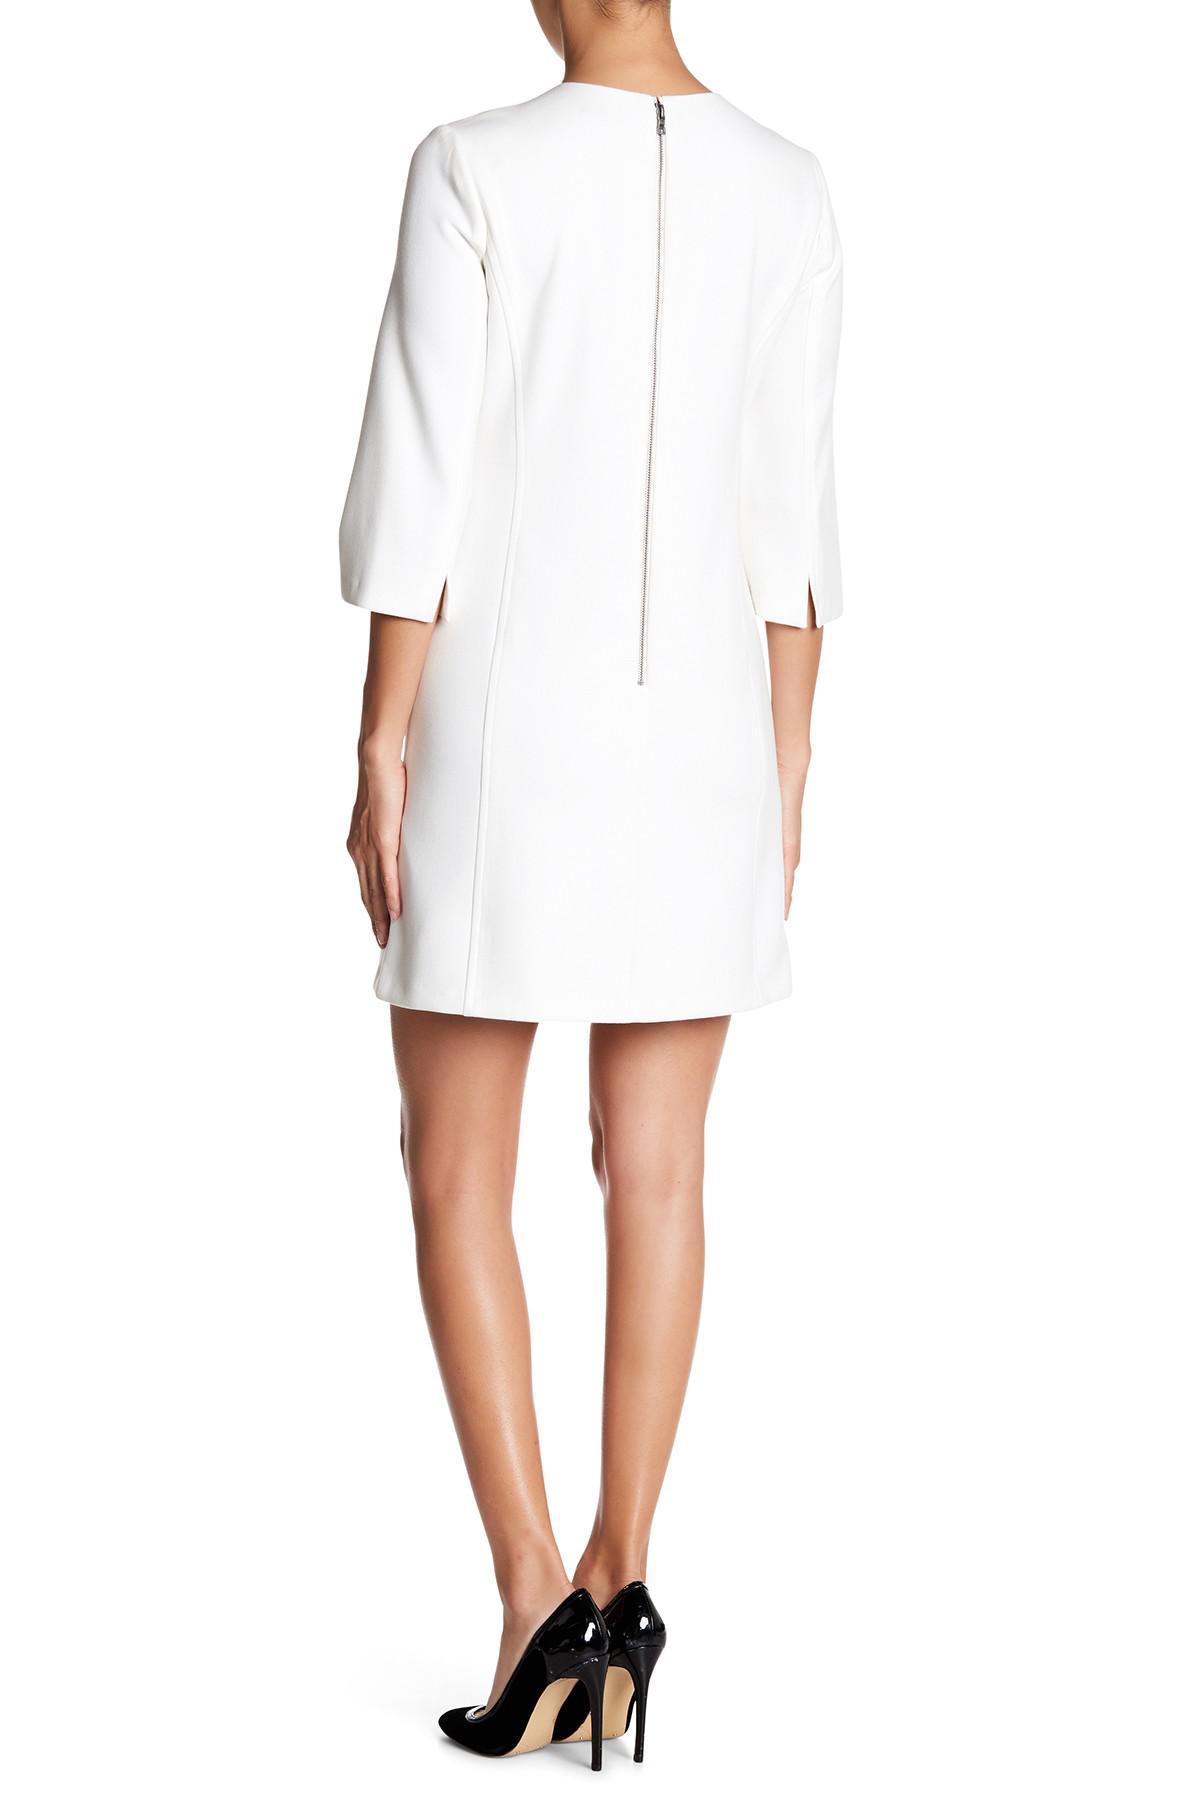 0541138c27b Lyst - Alice + Olivia Gem 3 4 Sleeve Shift Dress in White